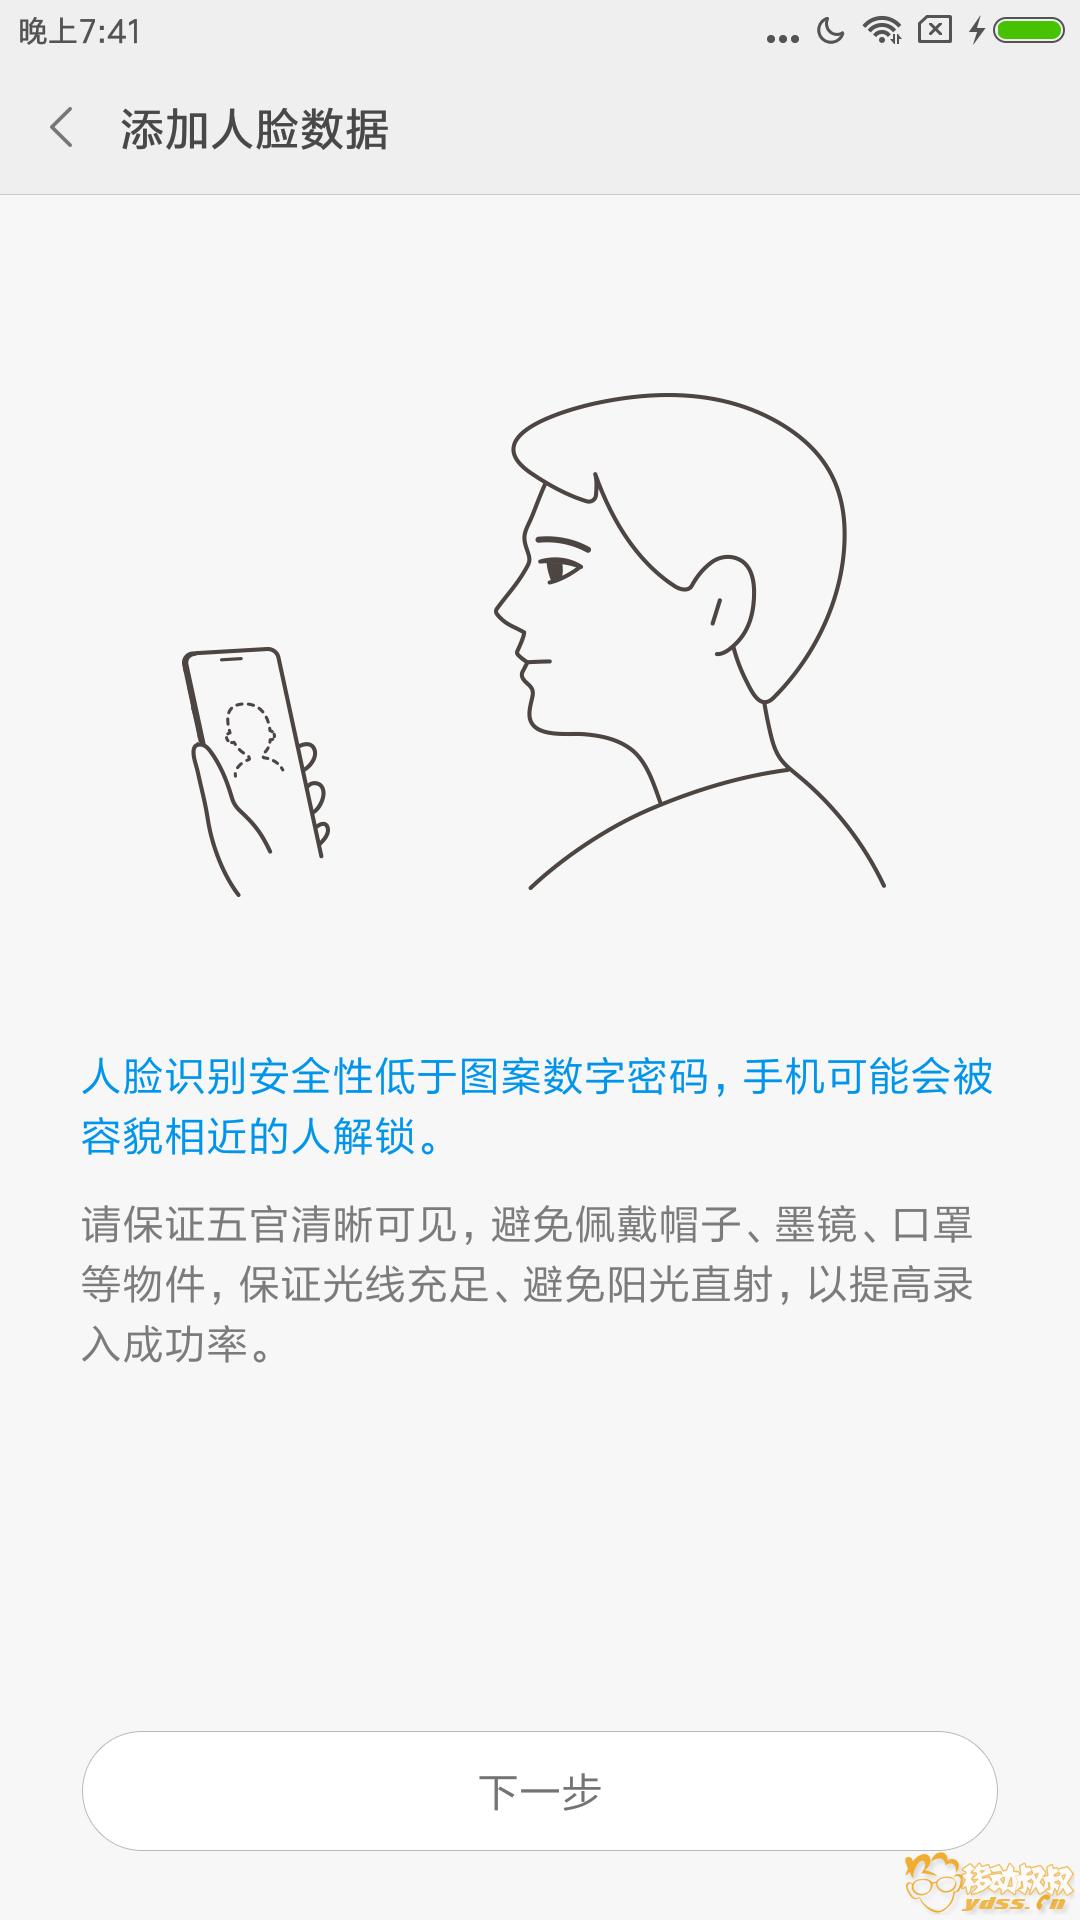 Screenshot_2018-03-07-19-41-45-054_com.android.keyguard.png